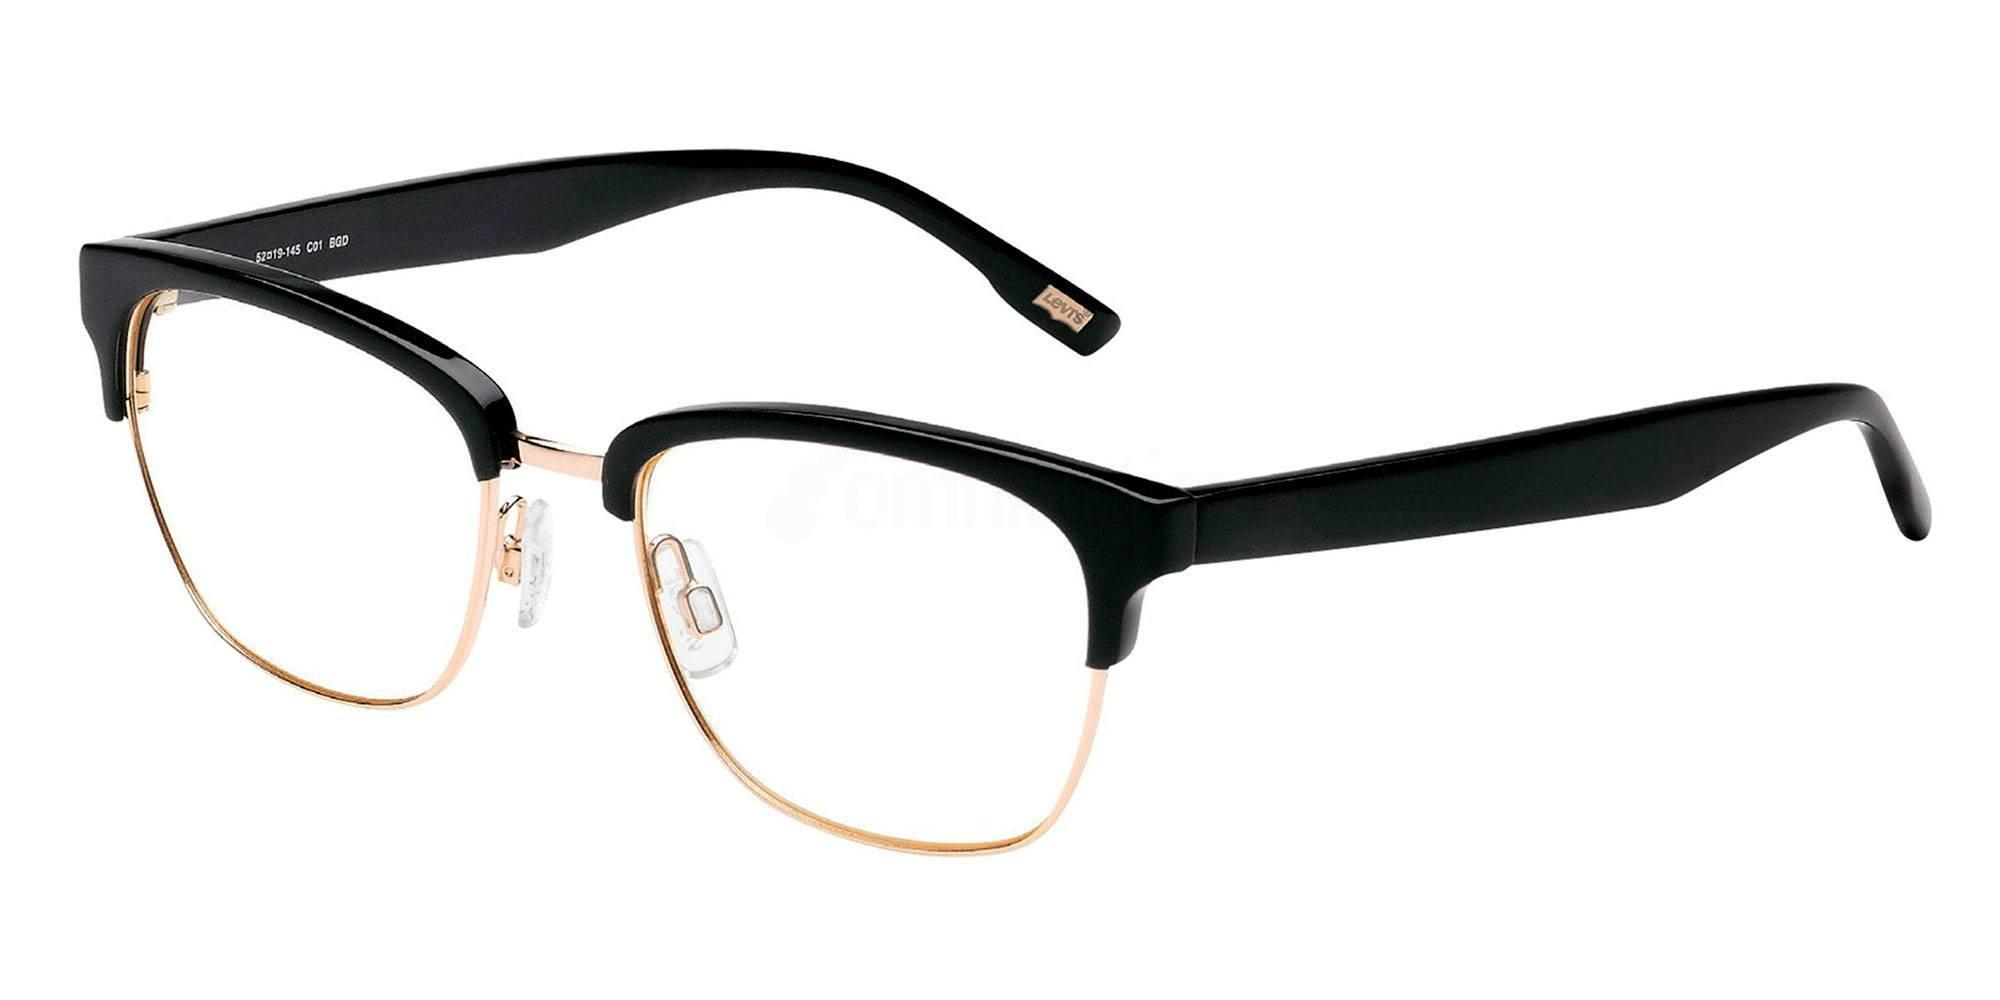 01 BDG LS113 , Levi's Eyewear